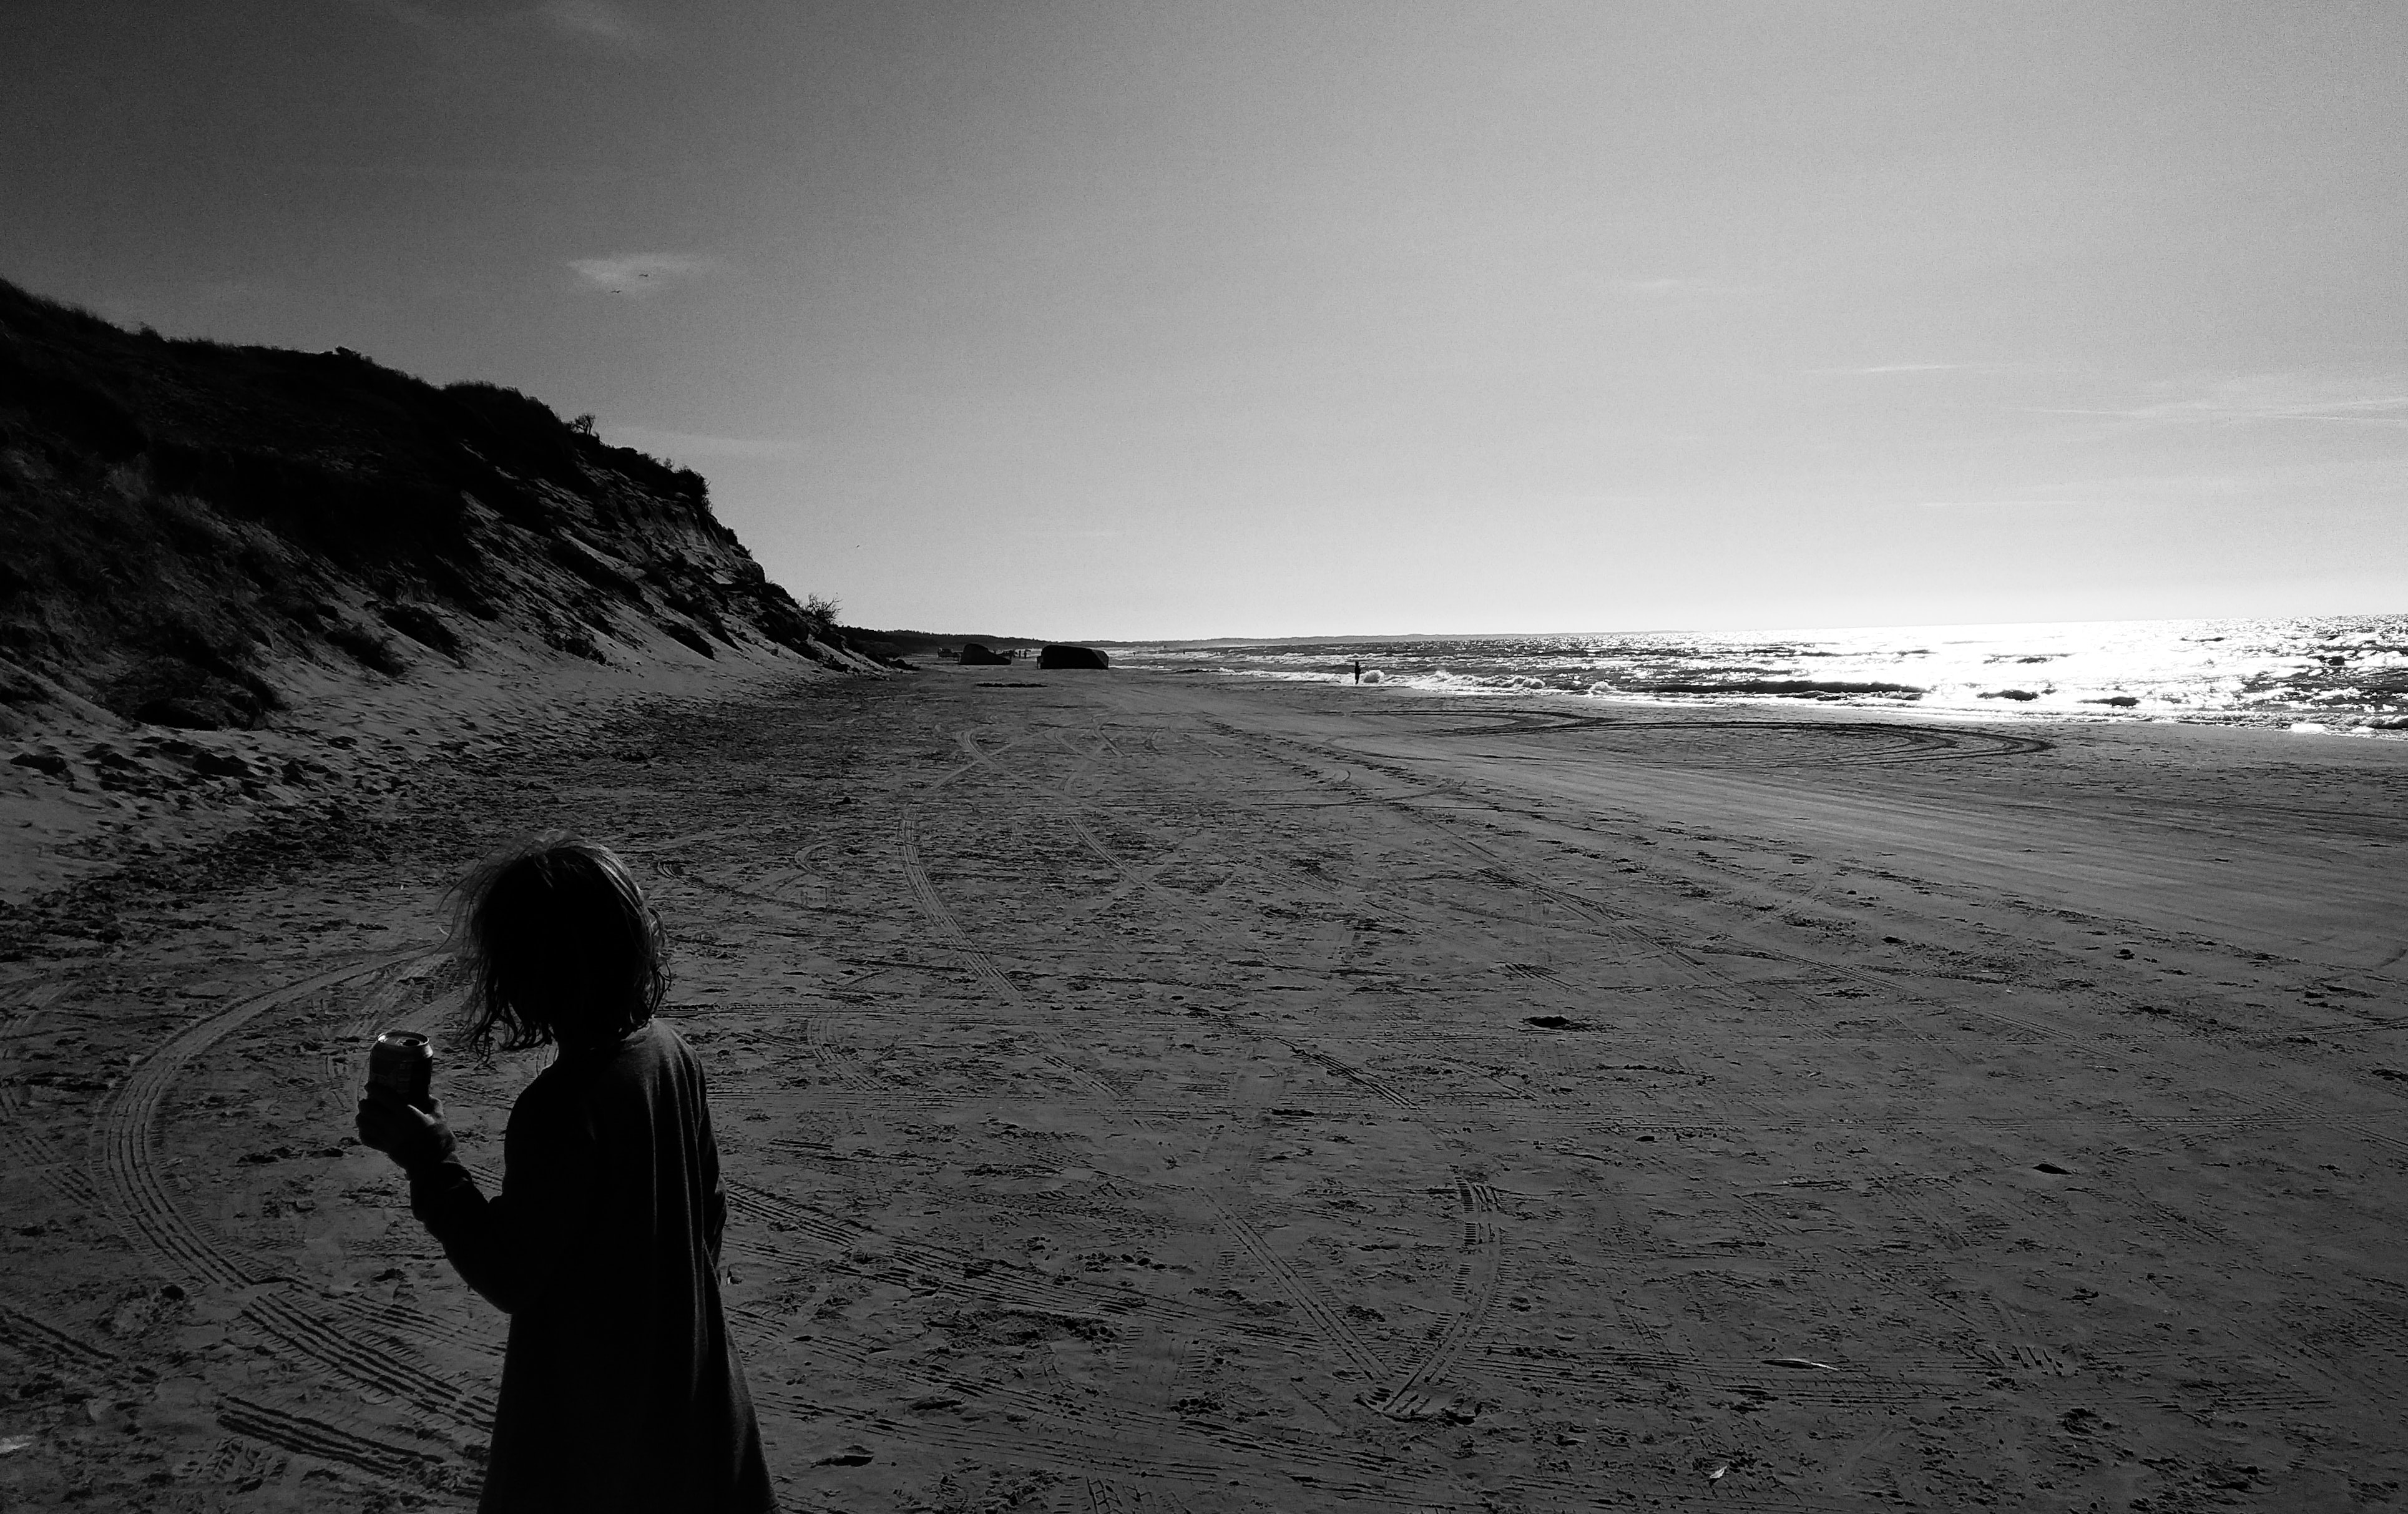 Tversted Strand (Arkivfoto: Elliott Matthews)